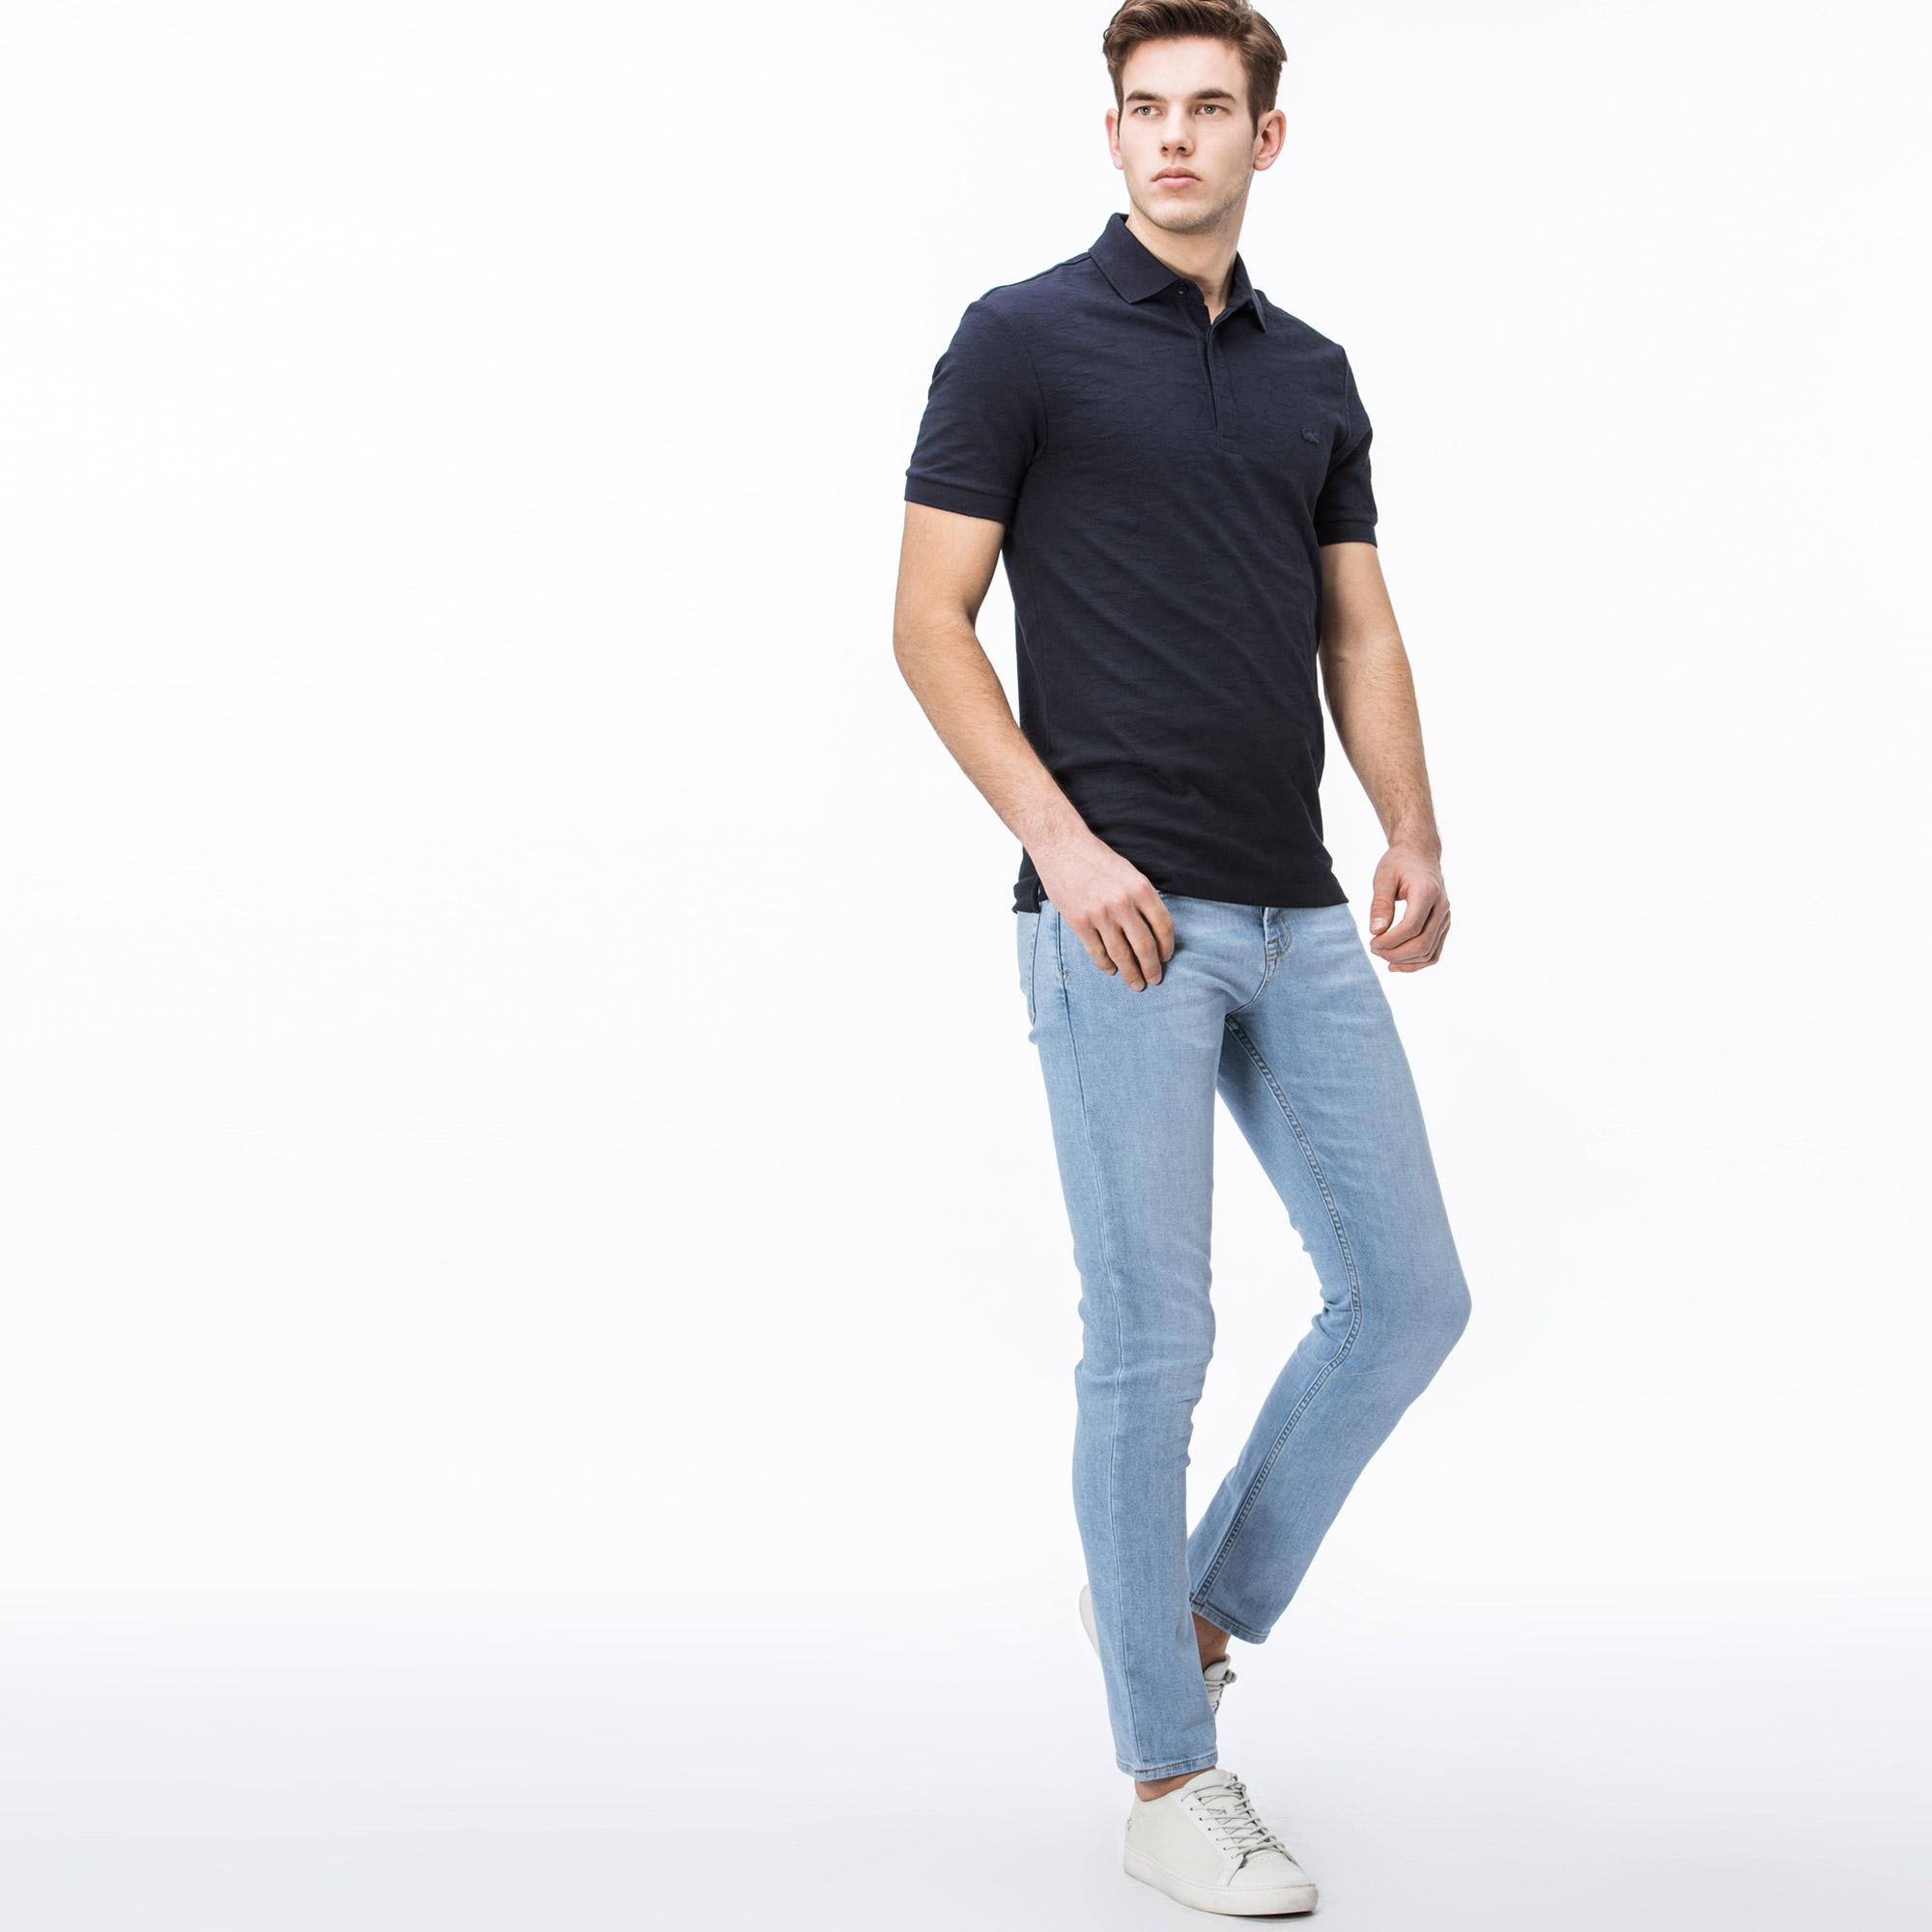 Lacoste Spodnie Męskie Slim Fit1